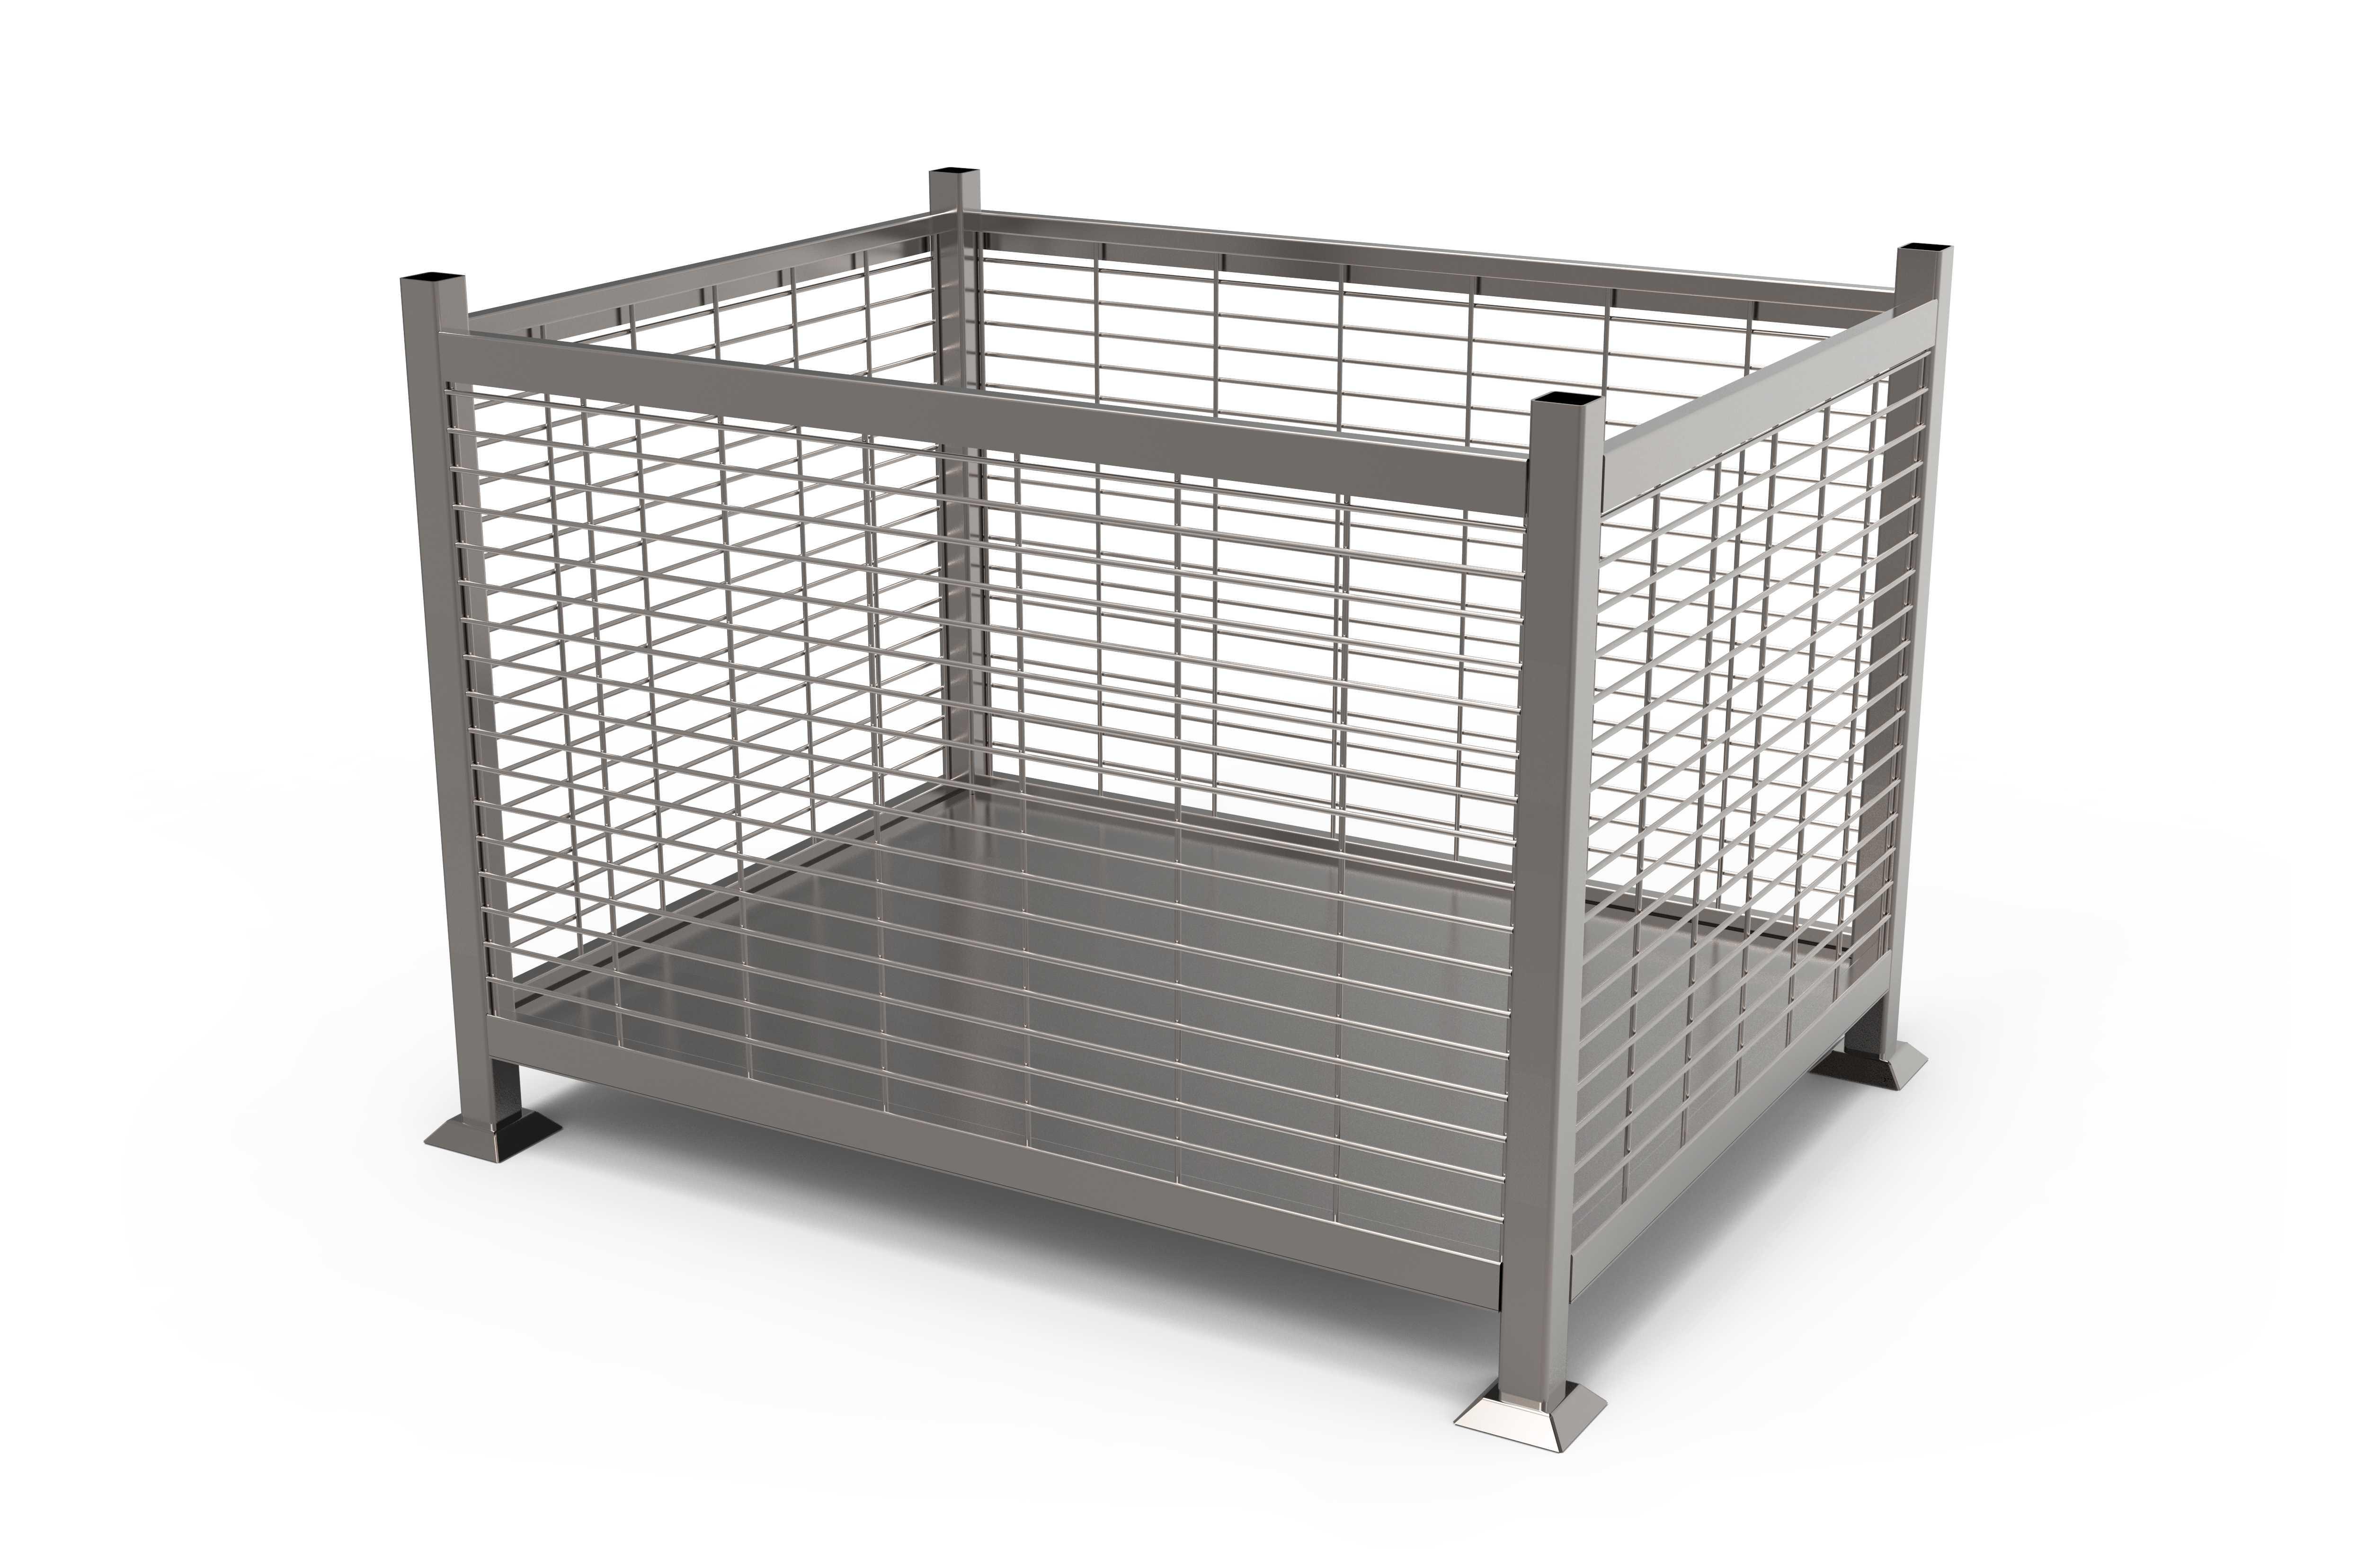 Pallet Stillage Cages